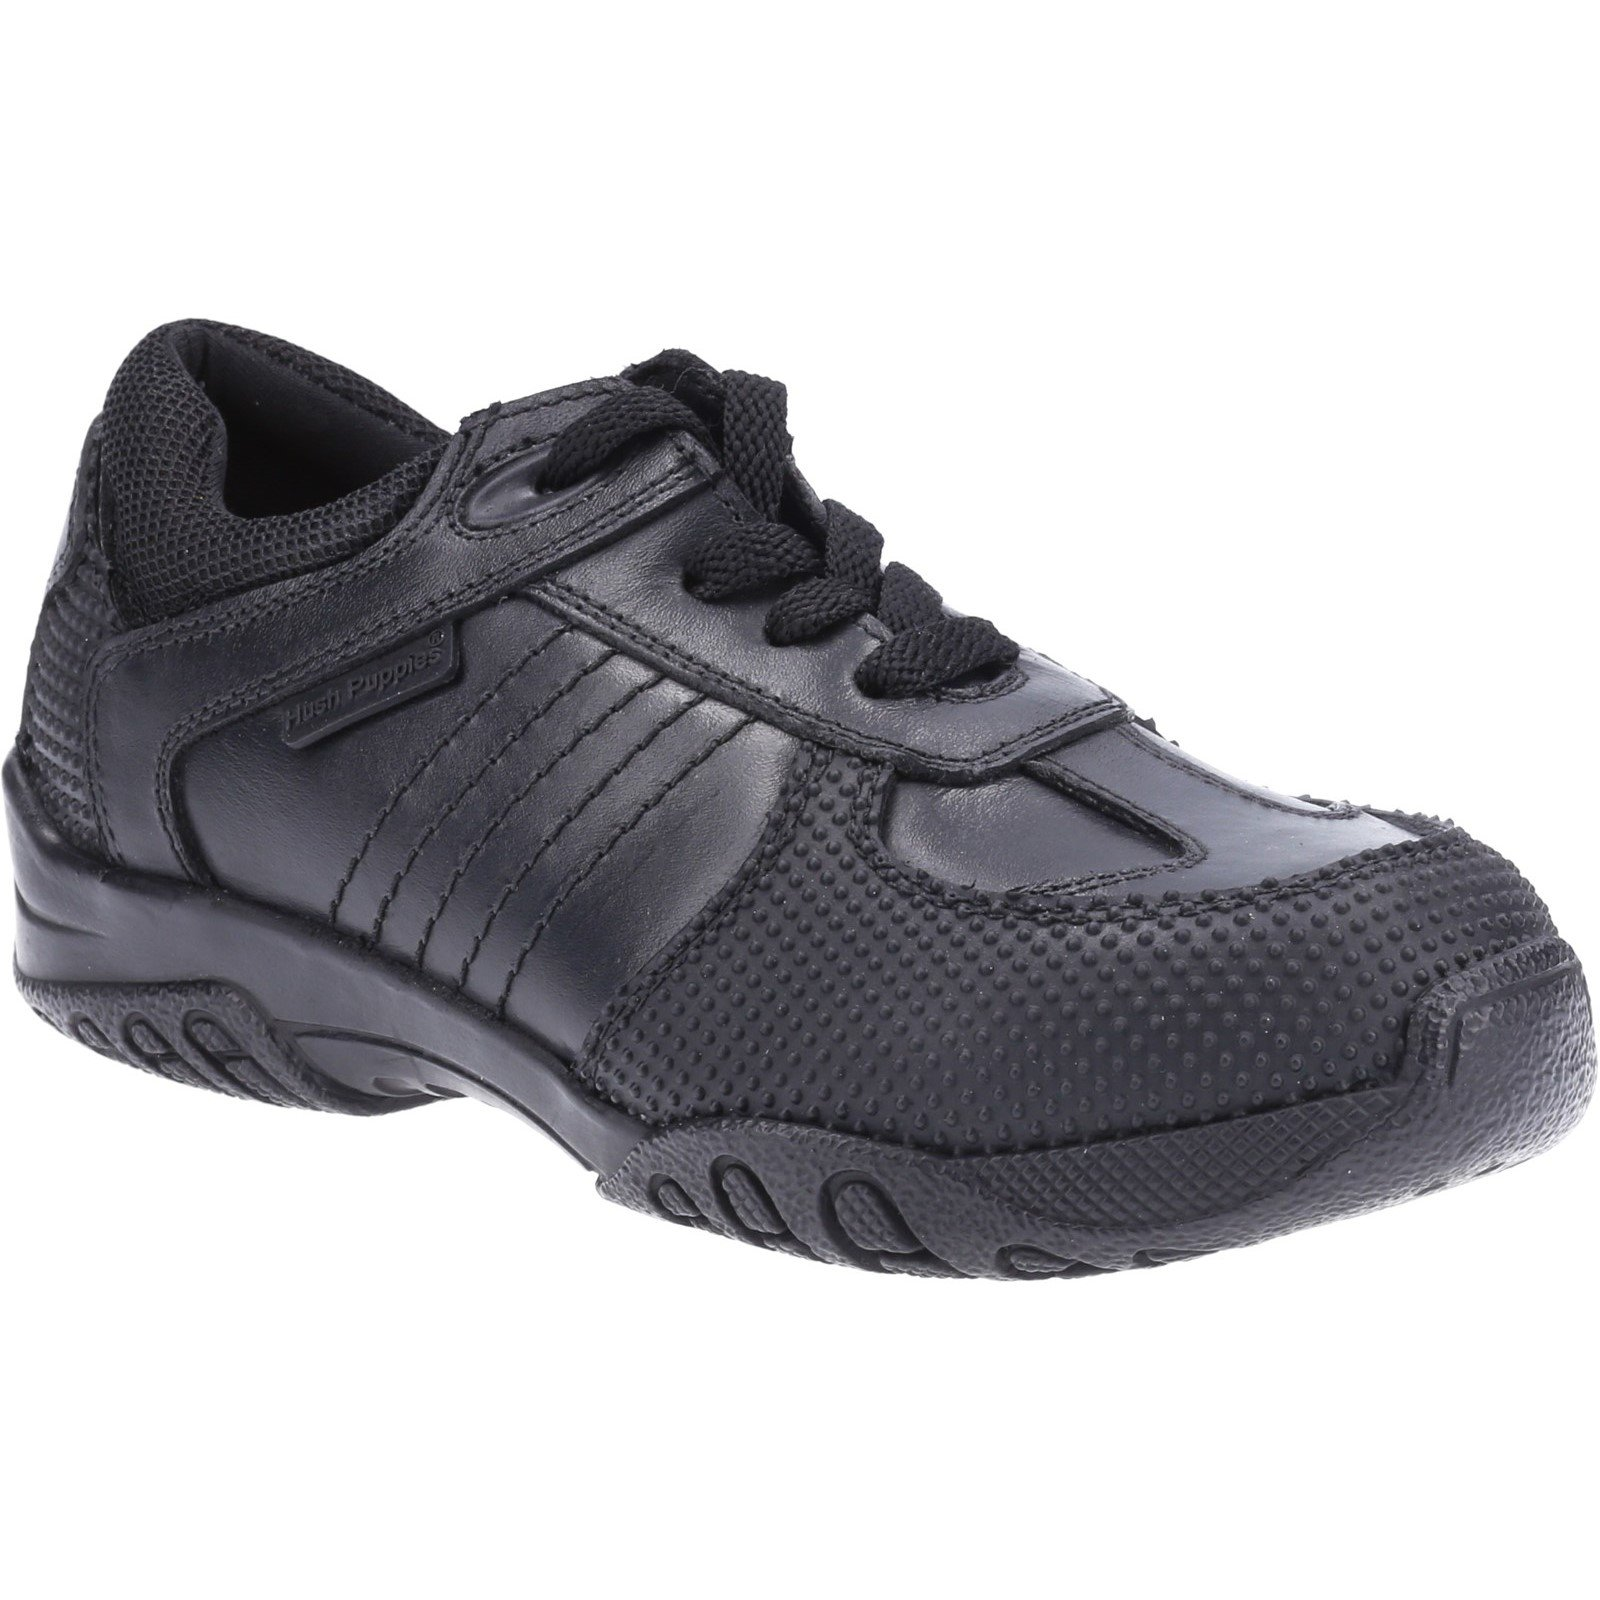 Hush Puppies Kid's Jezza Junior School Shoe Black 32587 - Black 12